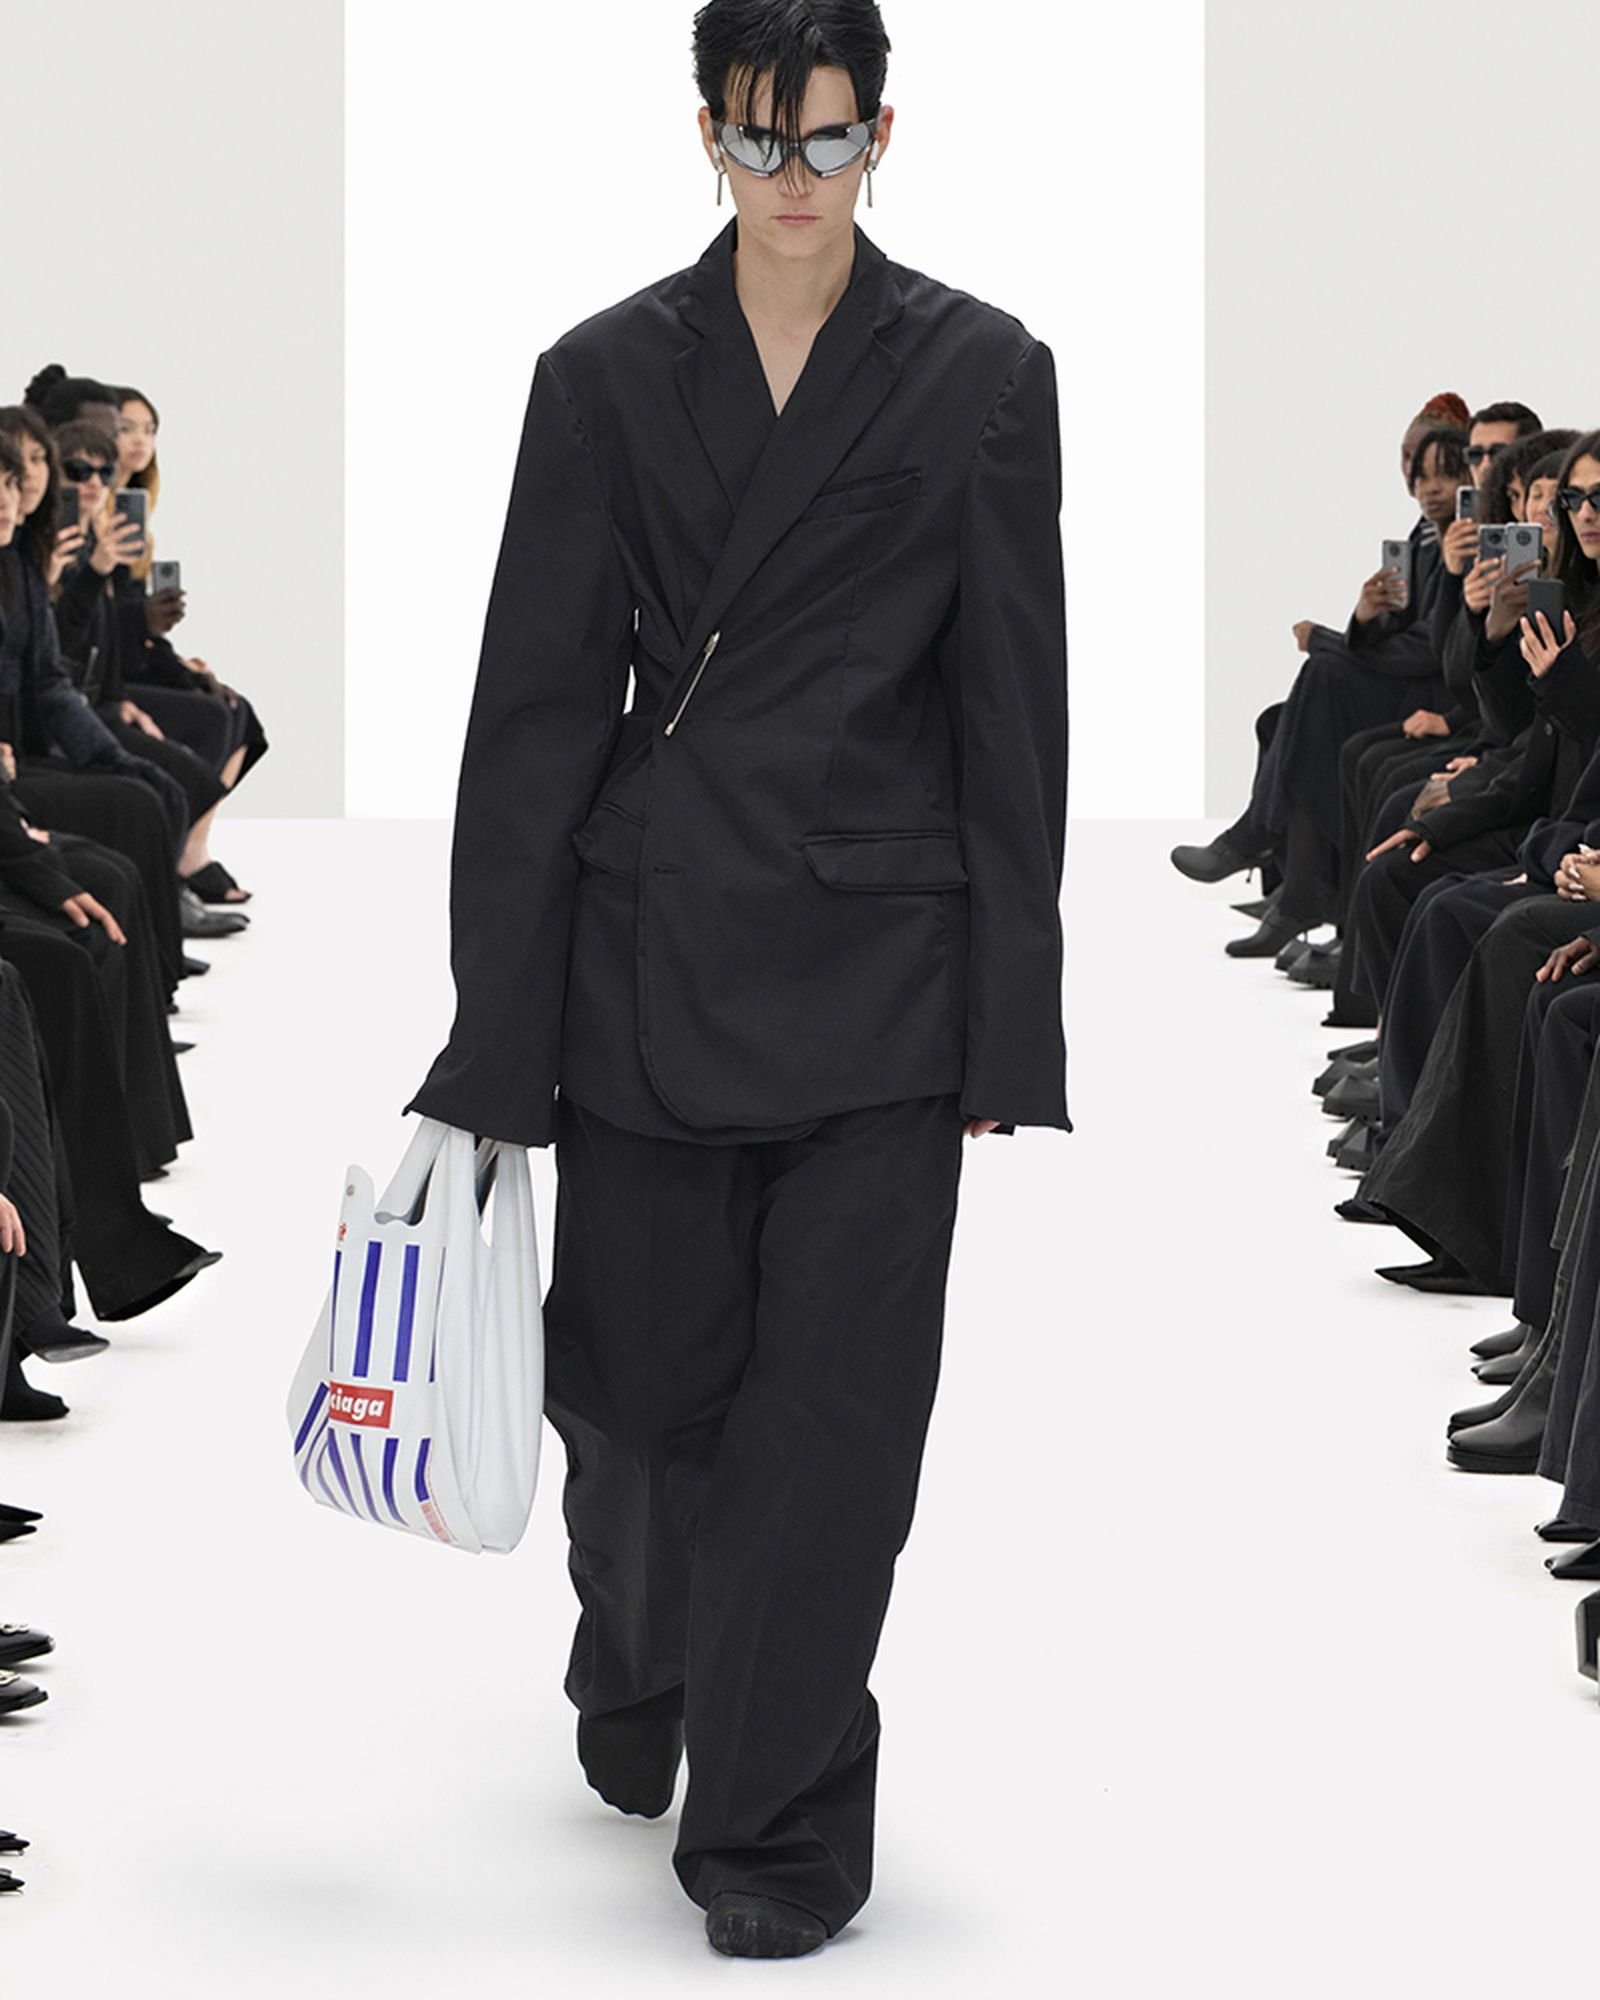 reusable shopping bags image